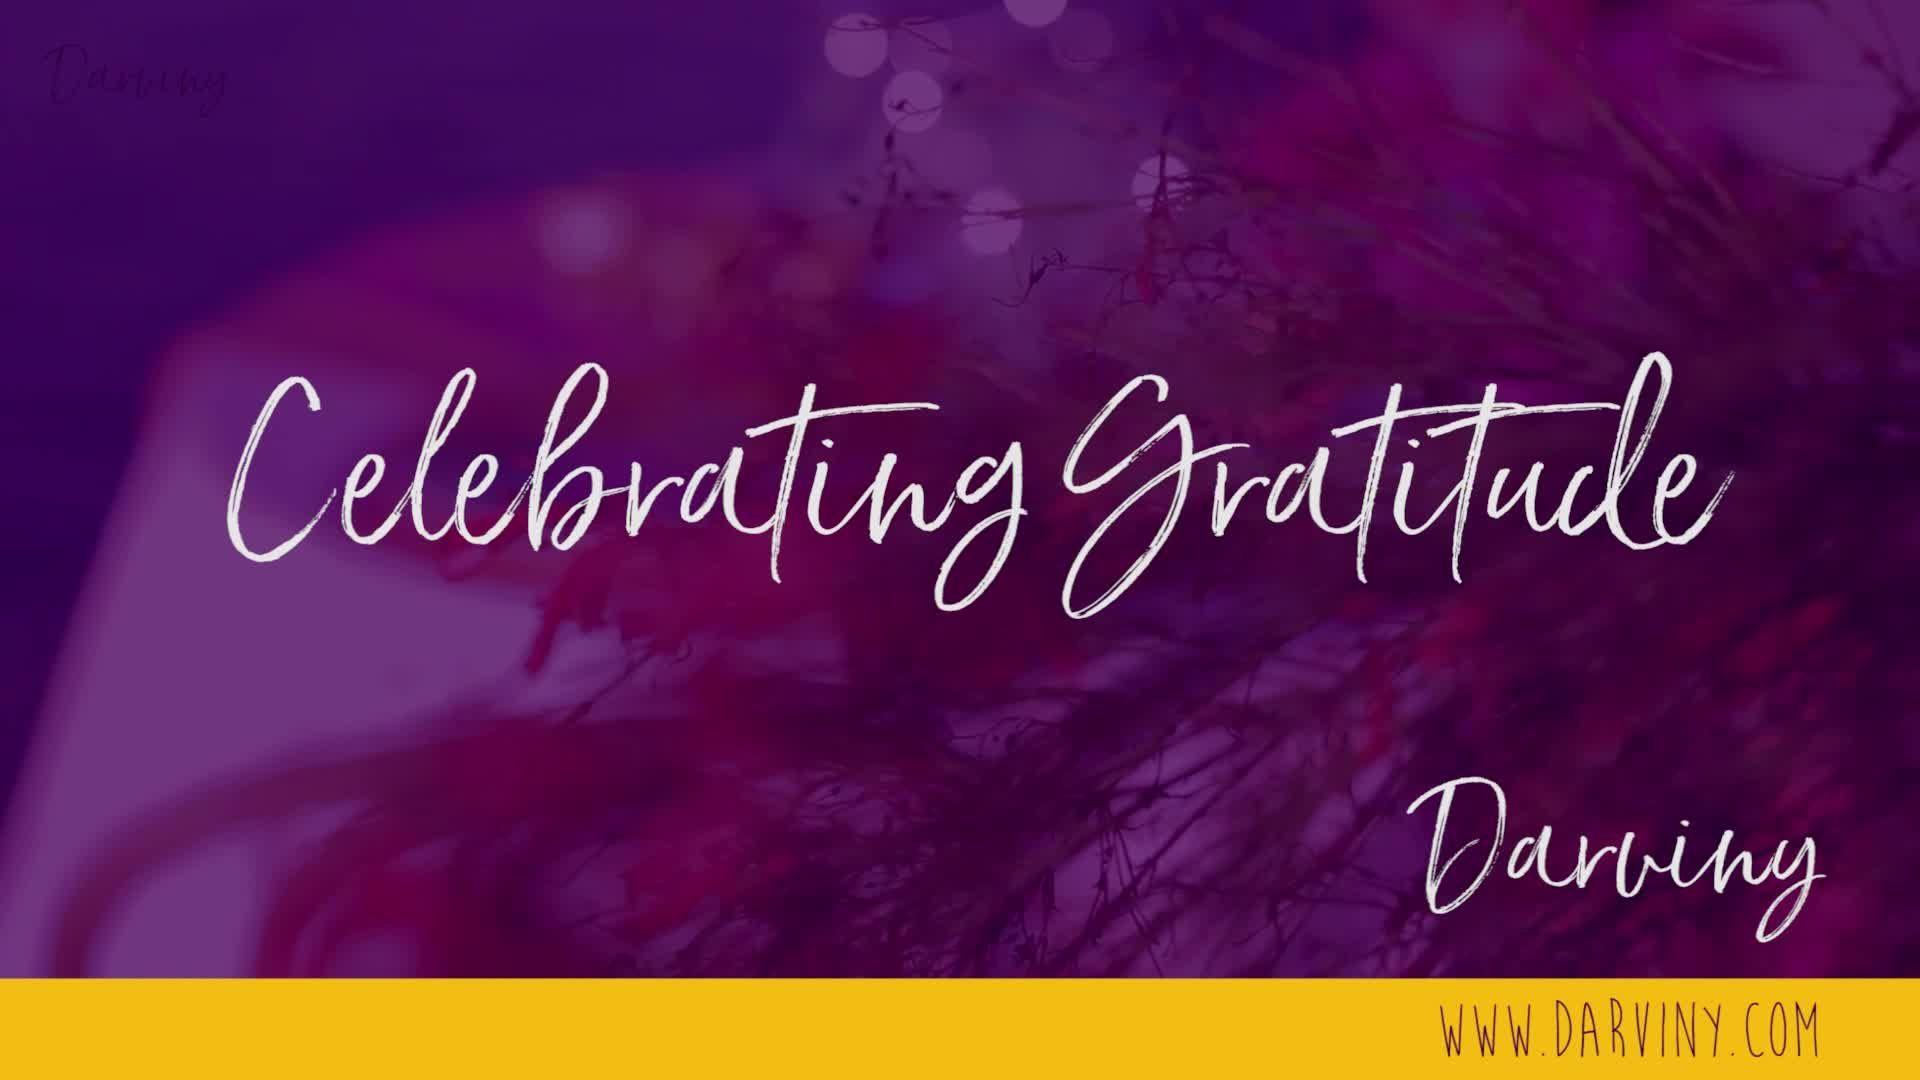 Darviny Tablescapes - Celebrating Gratitude